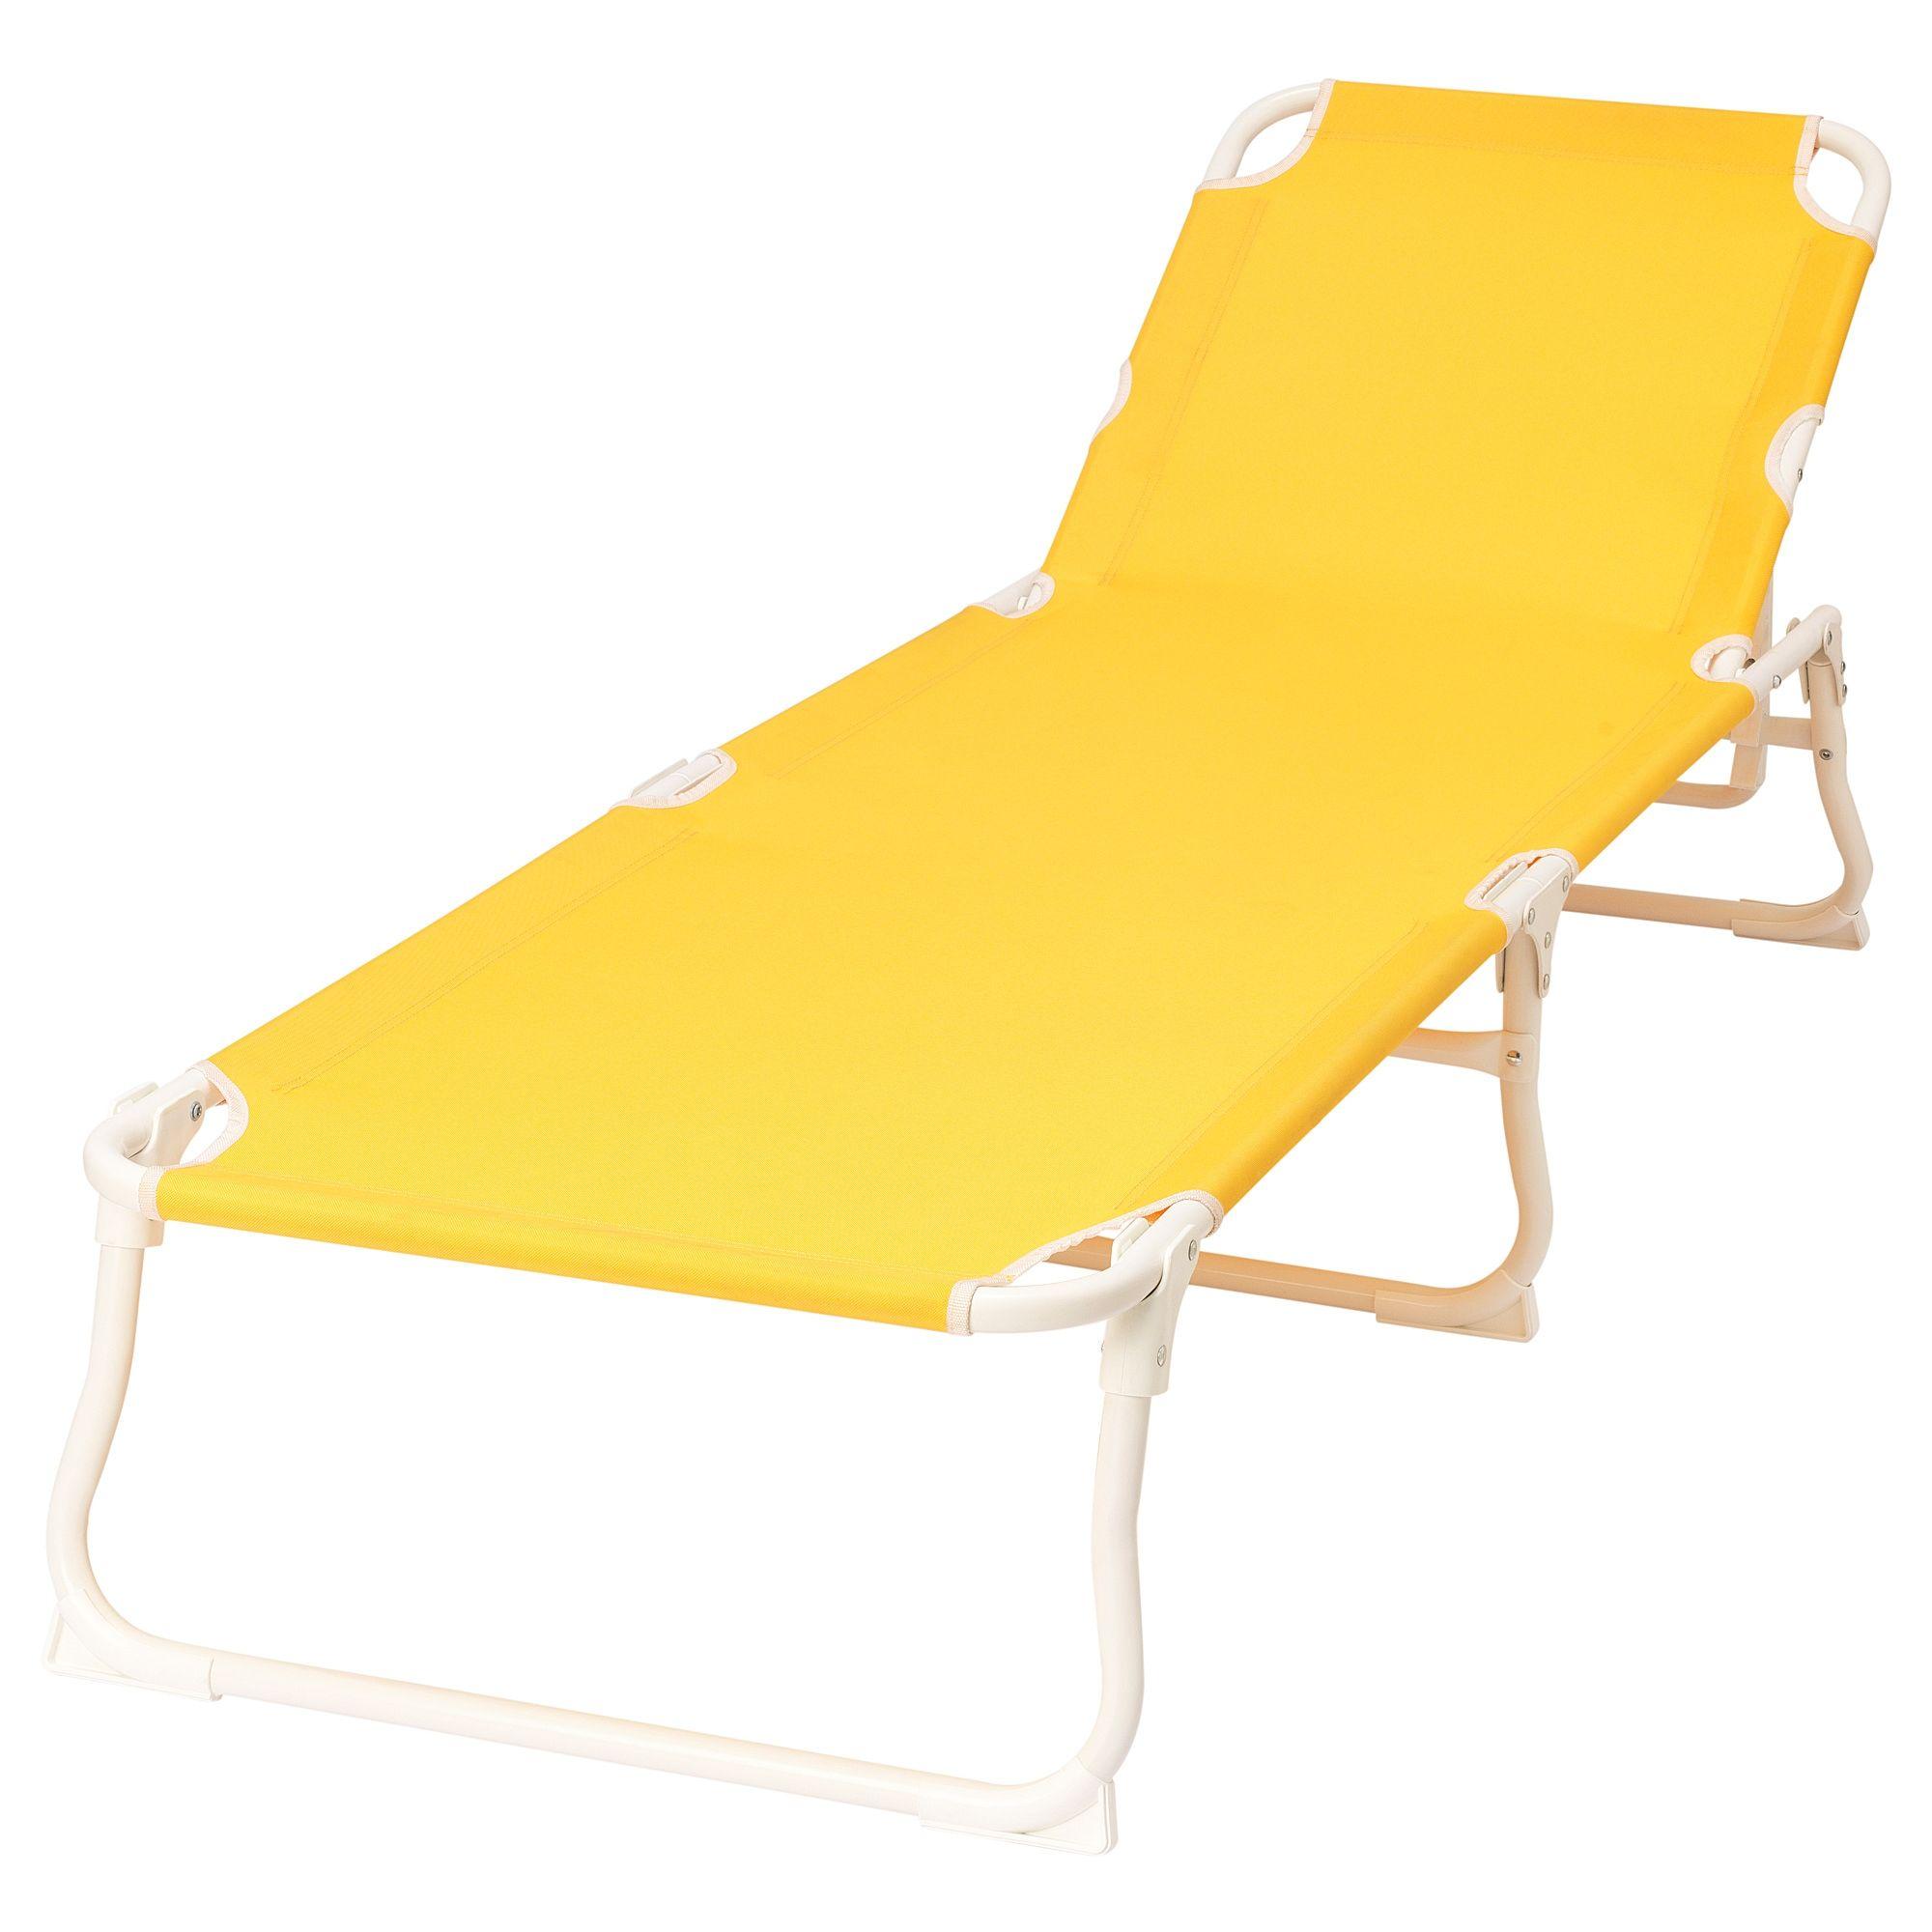 Hamo Sonnenliege Gelb Sonnenliege Ikea Outdoor Strand Liegestuhl